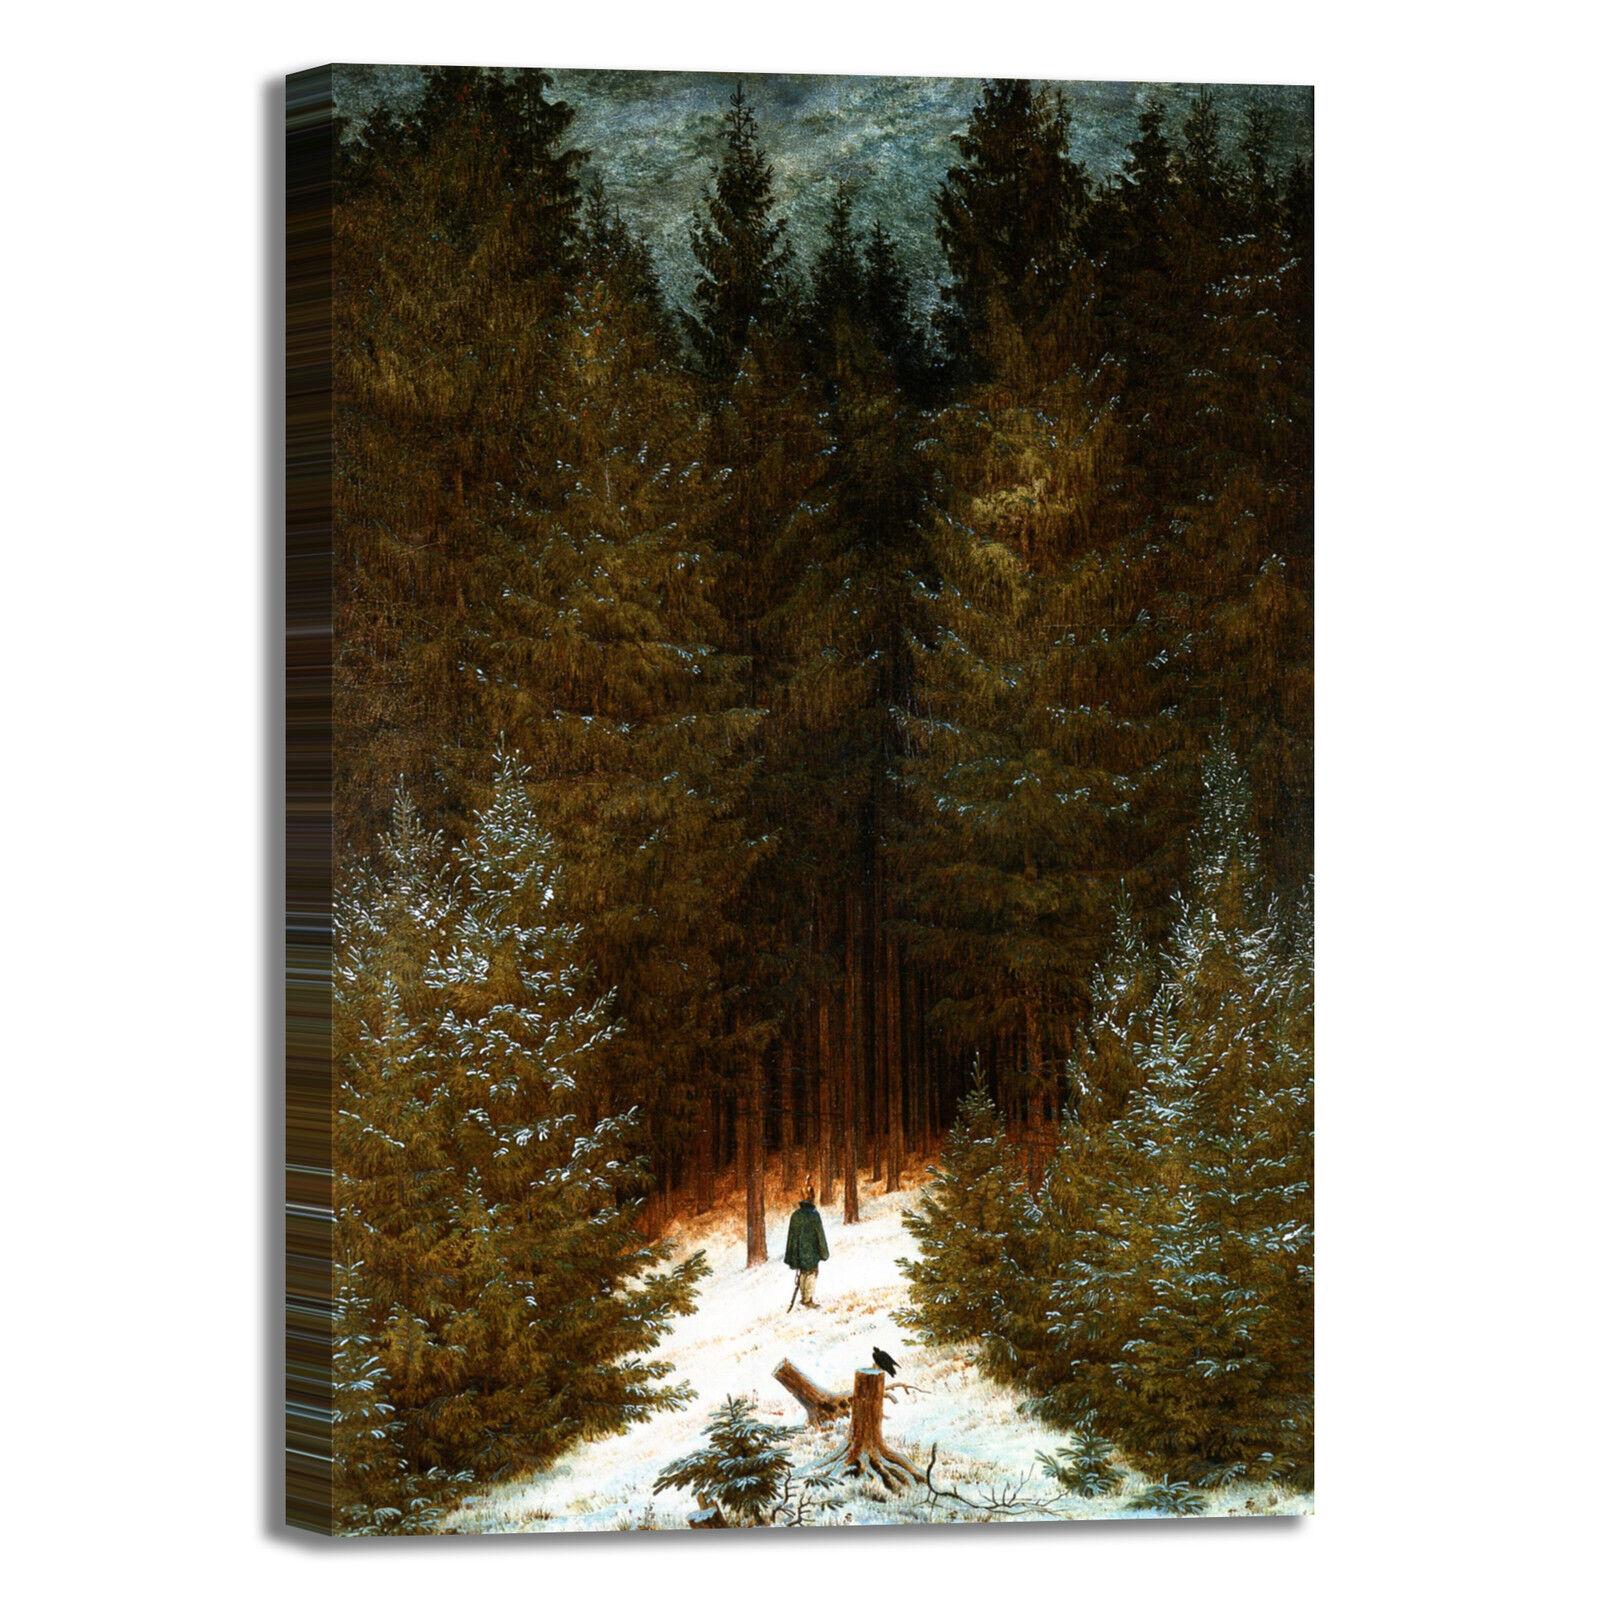 Caspar cacciatore nella foresta quadro stampa tela dipinto casa telaio arRouge o casa dipinto e43dcc